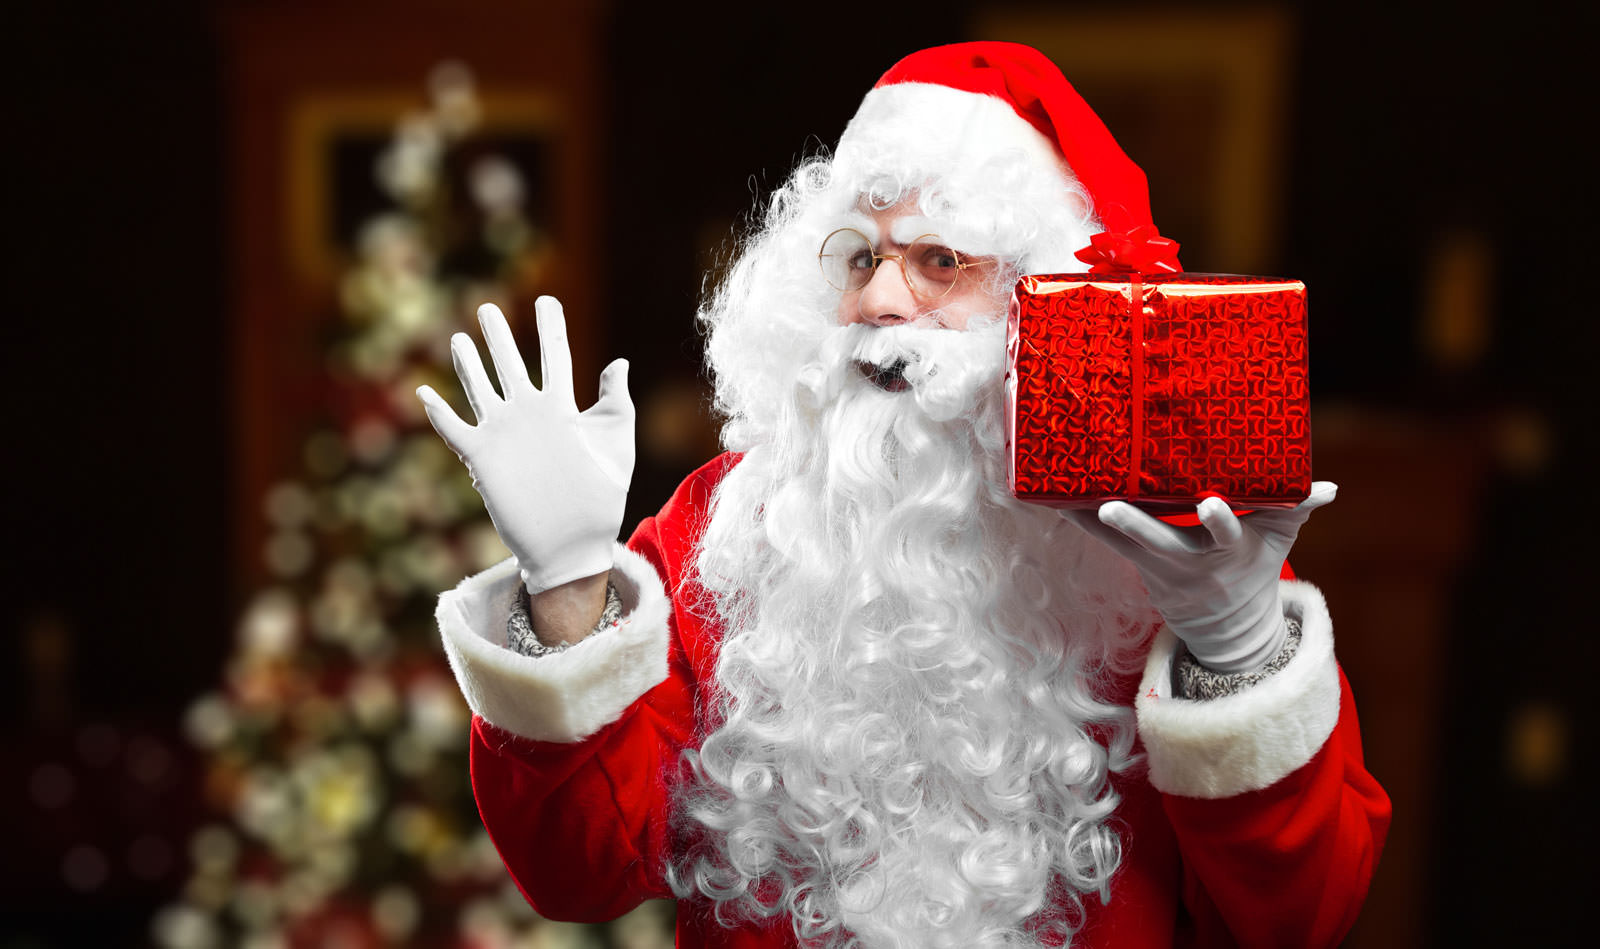 Christian Parents Should NOT Use Santa to Get Good Deeds